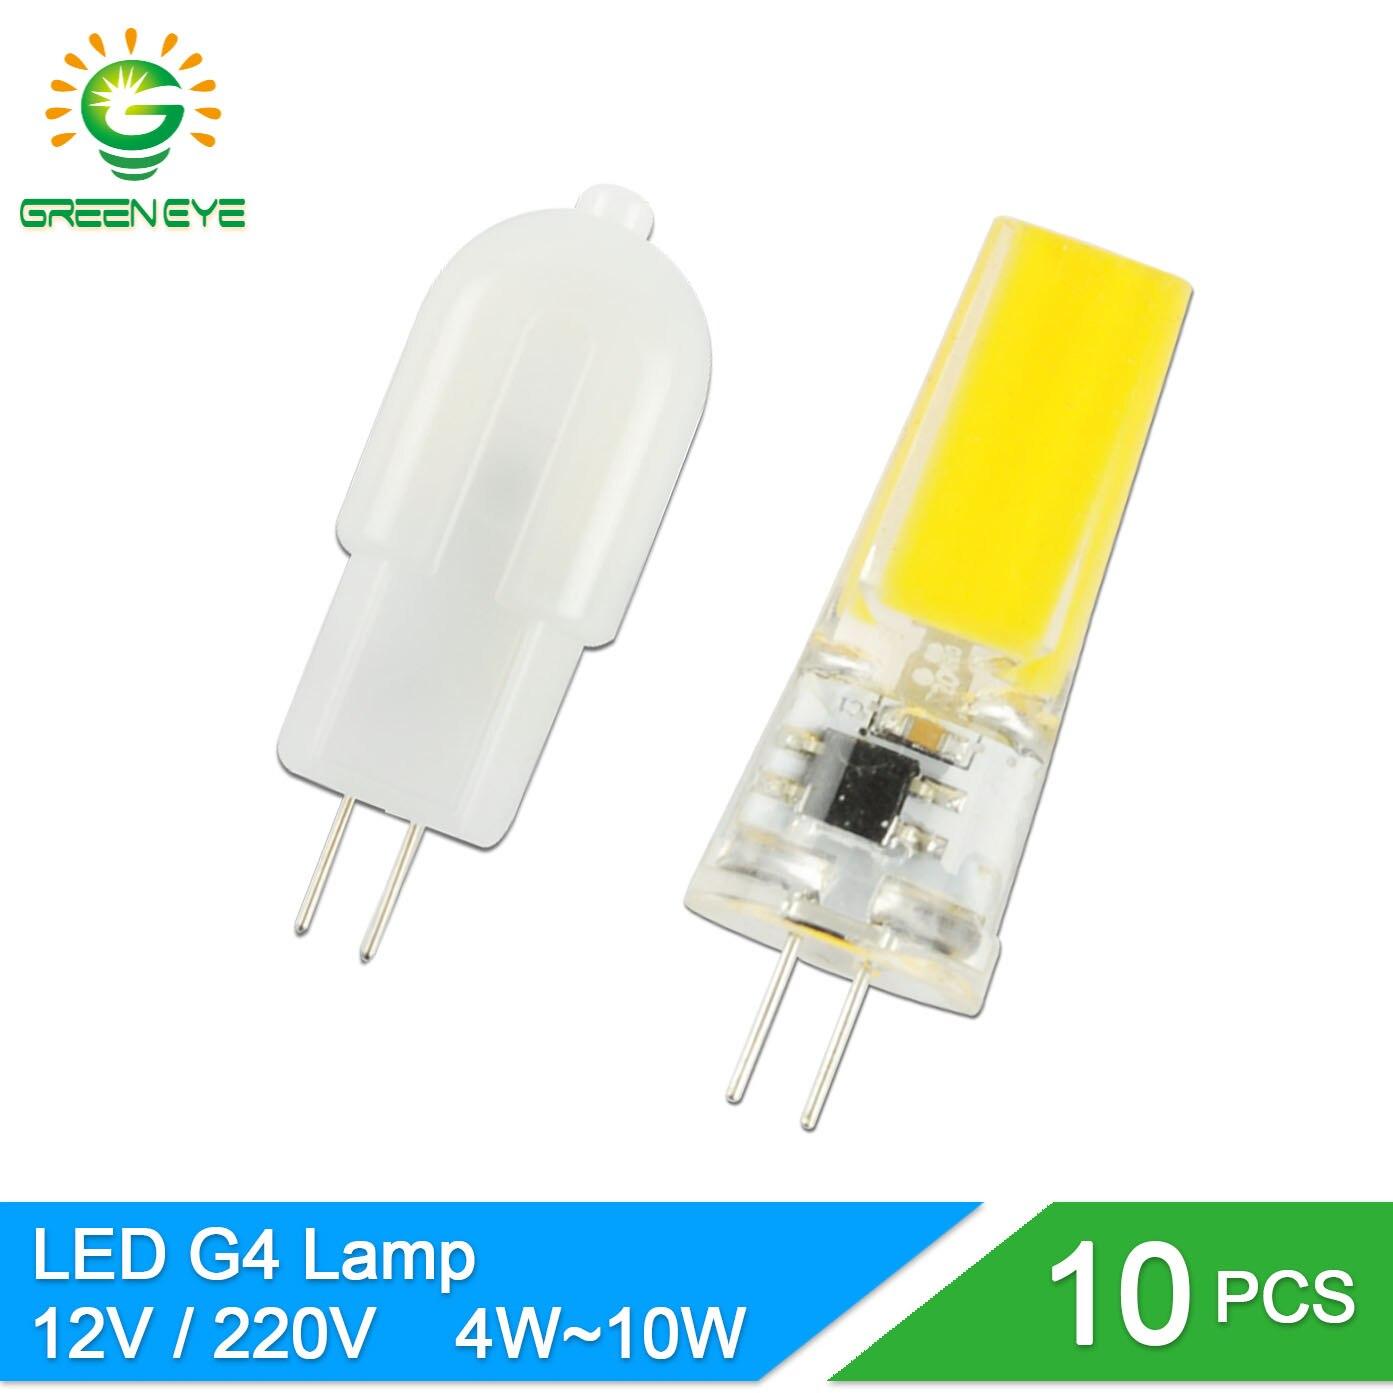 GreenEye 10Pcs Mini G4 LED Lampe AC220V / ACDC12V SMD2835 4W 6W 10W Dimmbare Ampulle Lampada LED G4 Birne Ersetzen Halogen Kristall